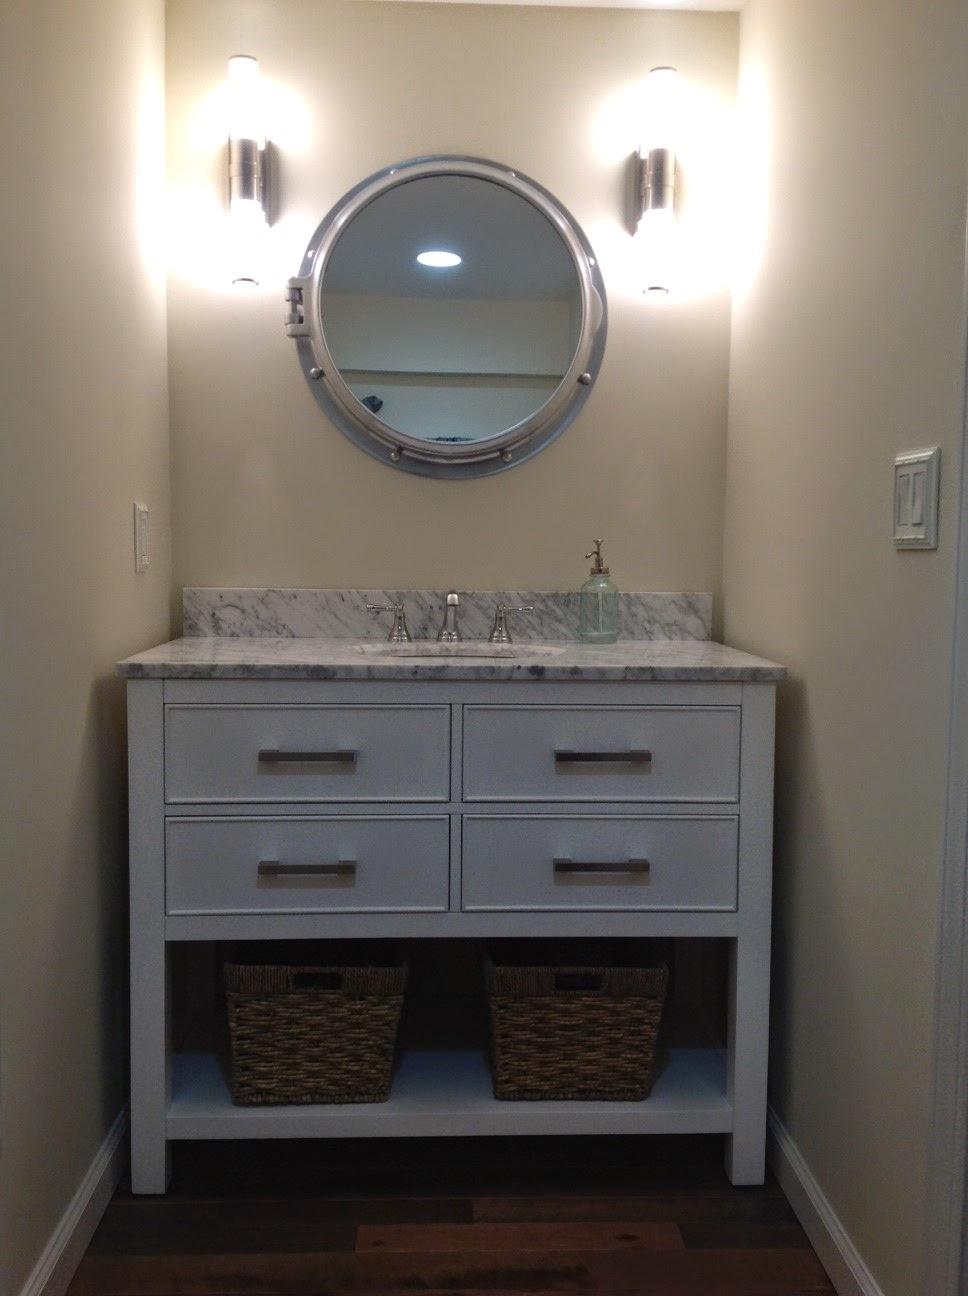 Half Bathroom Vanity Design400622 Half Bathroom Vanity Showing Post Media For Half